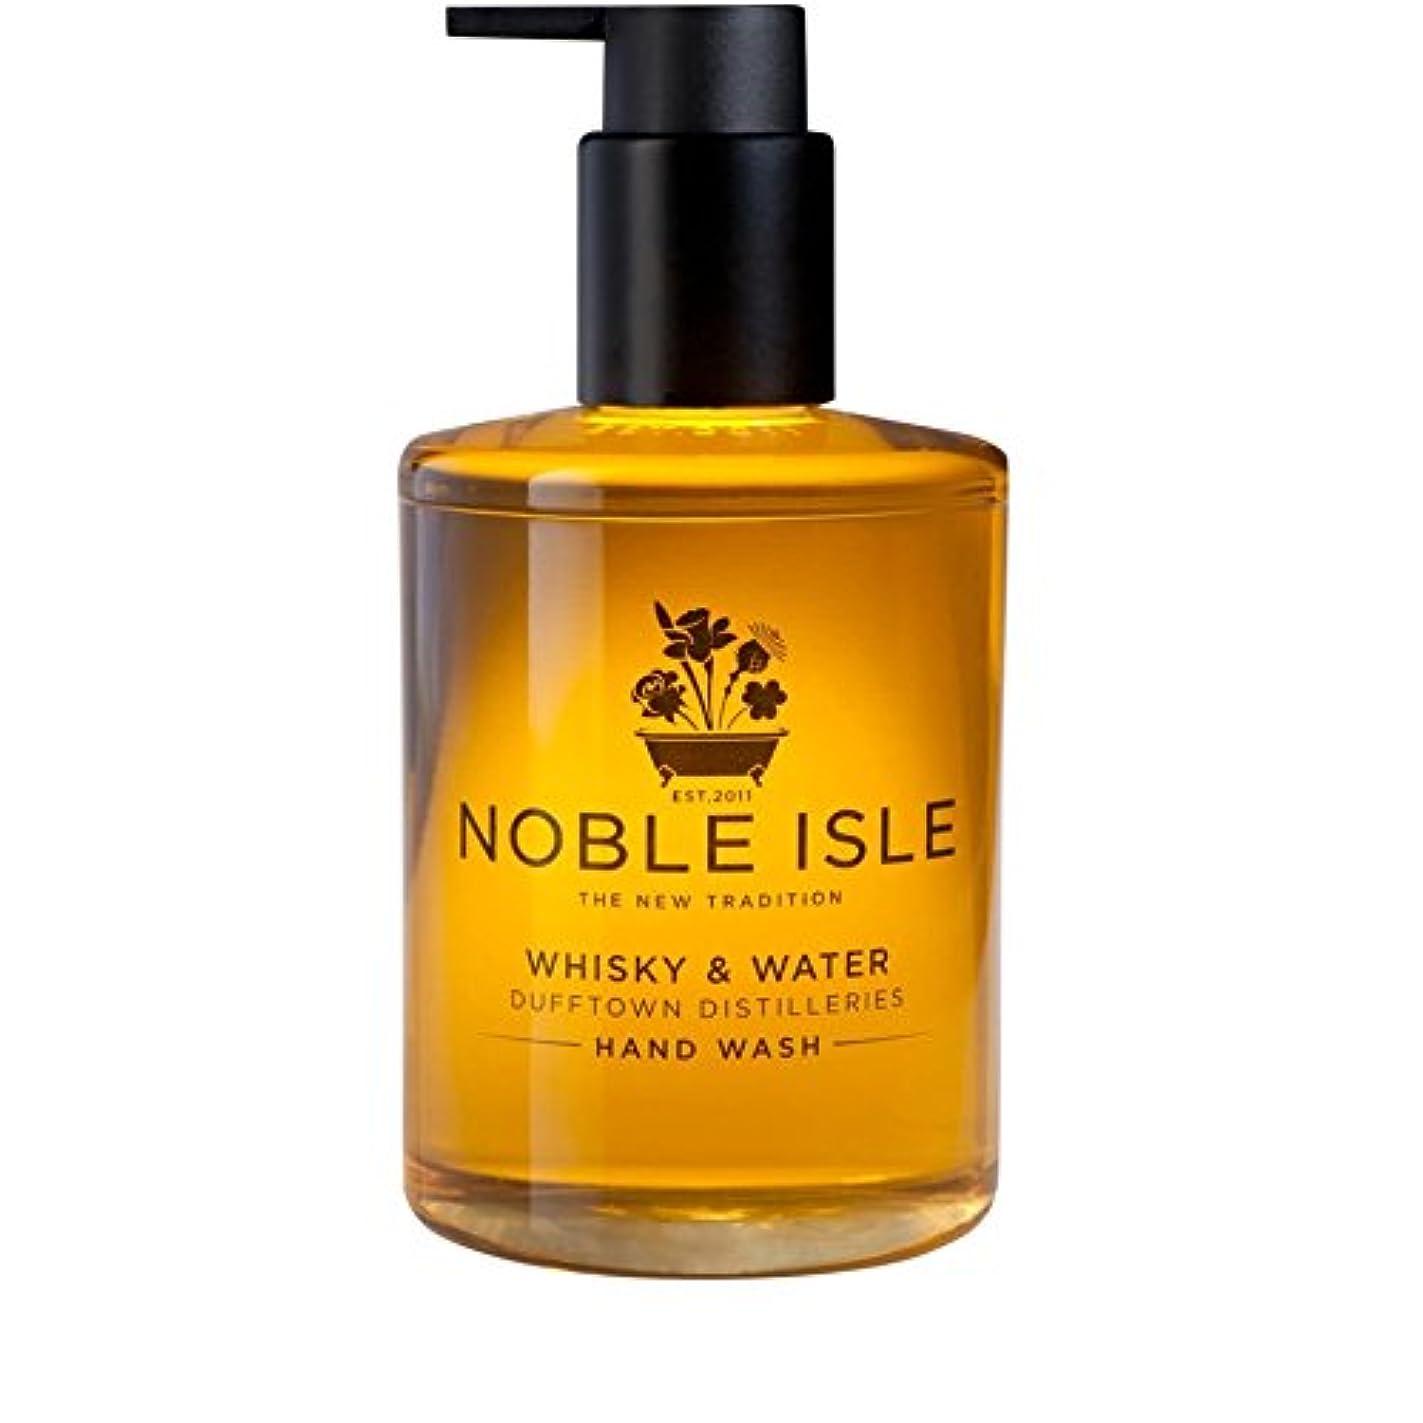 Noble Isle Whisky and Water Dufftown Distilleries Hand Wash 250ml - 高貴な島の水割りの蒸留所のハンドウォッシュ250ミリリットル [並行輸入品]